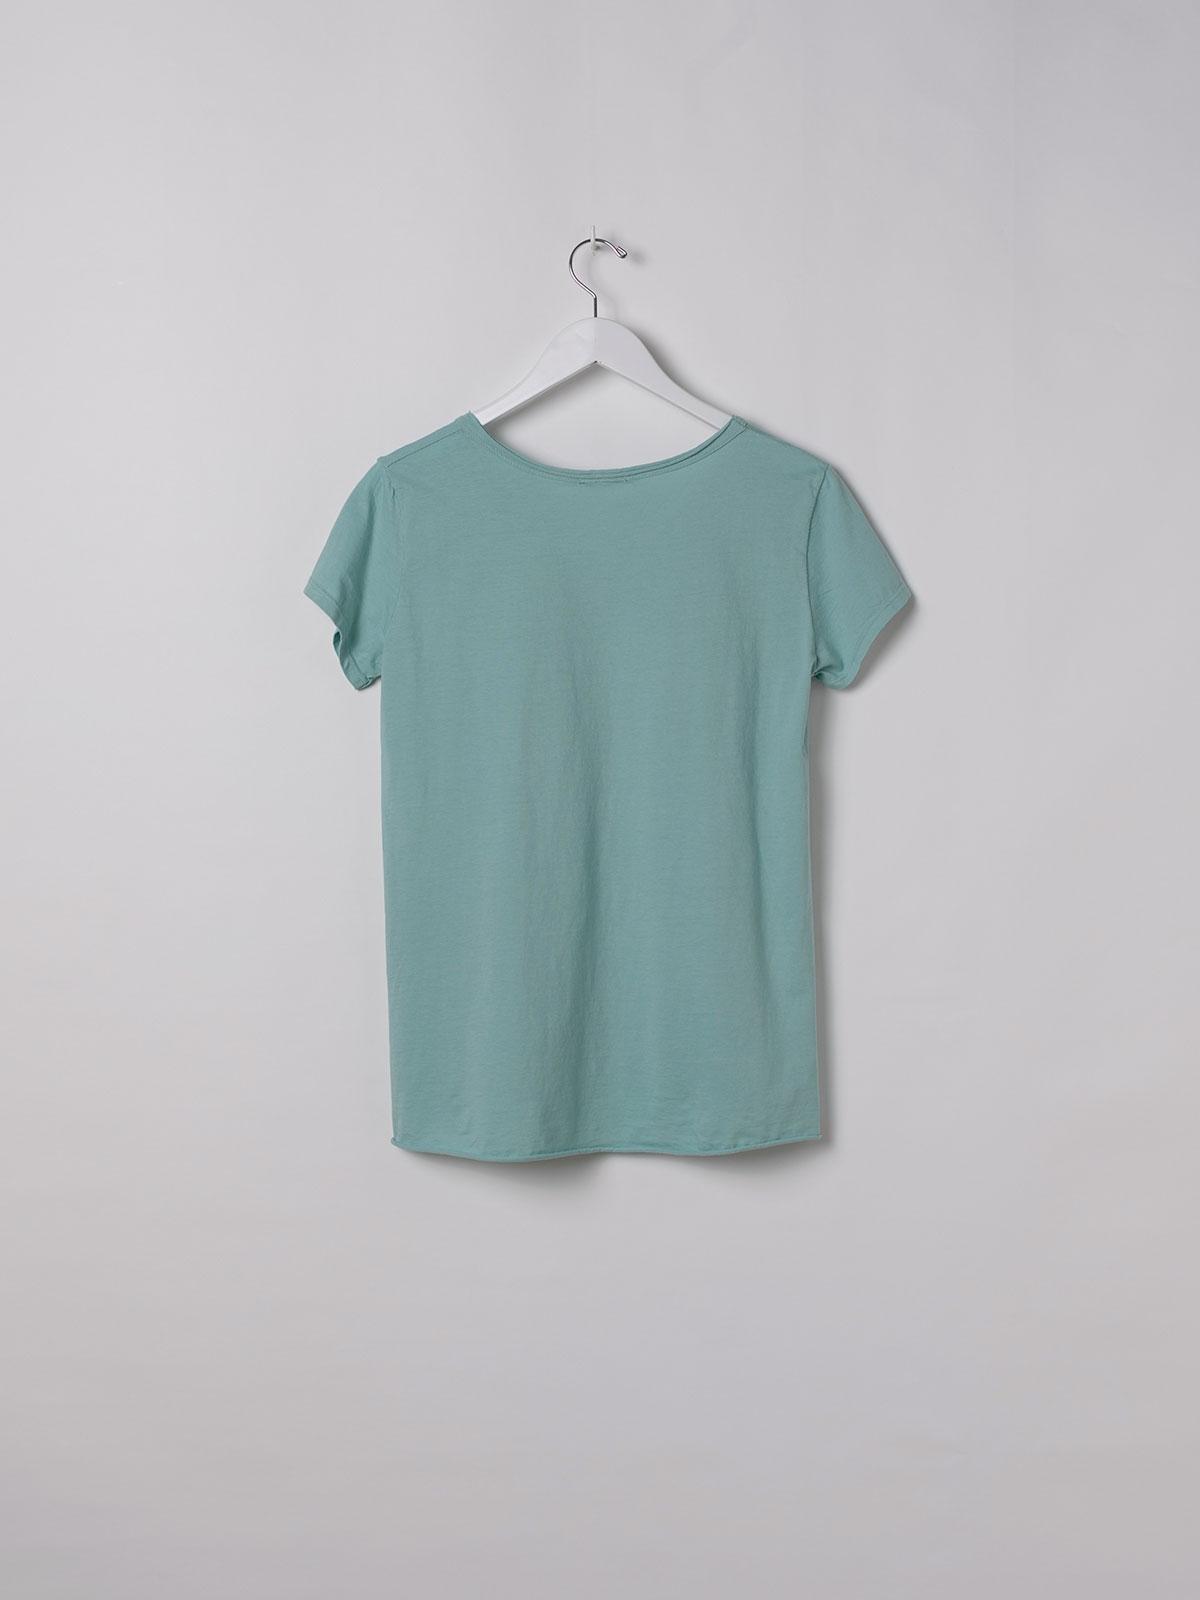 Camiseta mujer lisa algodón Aqua